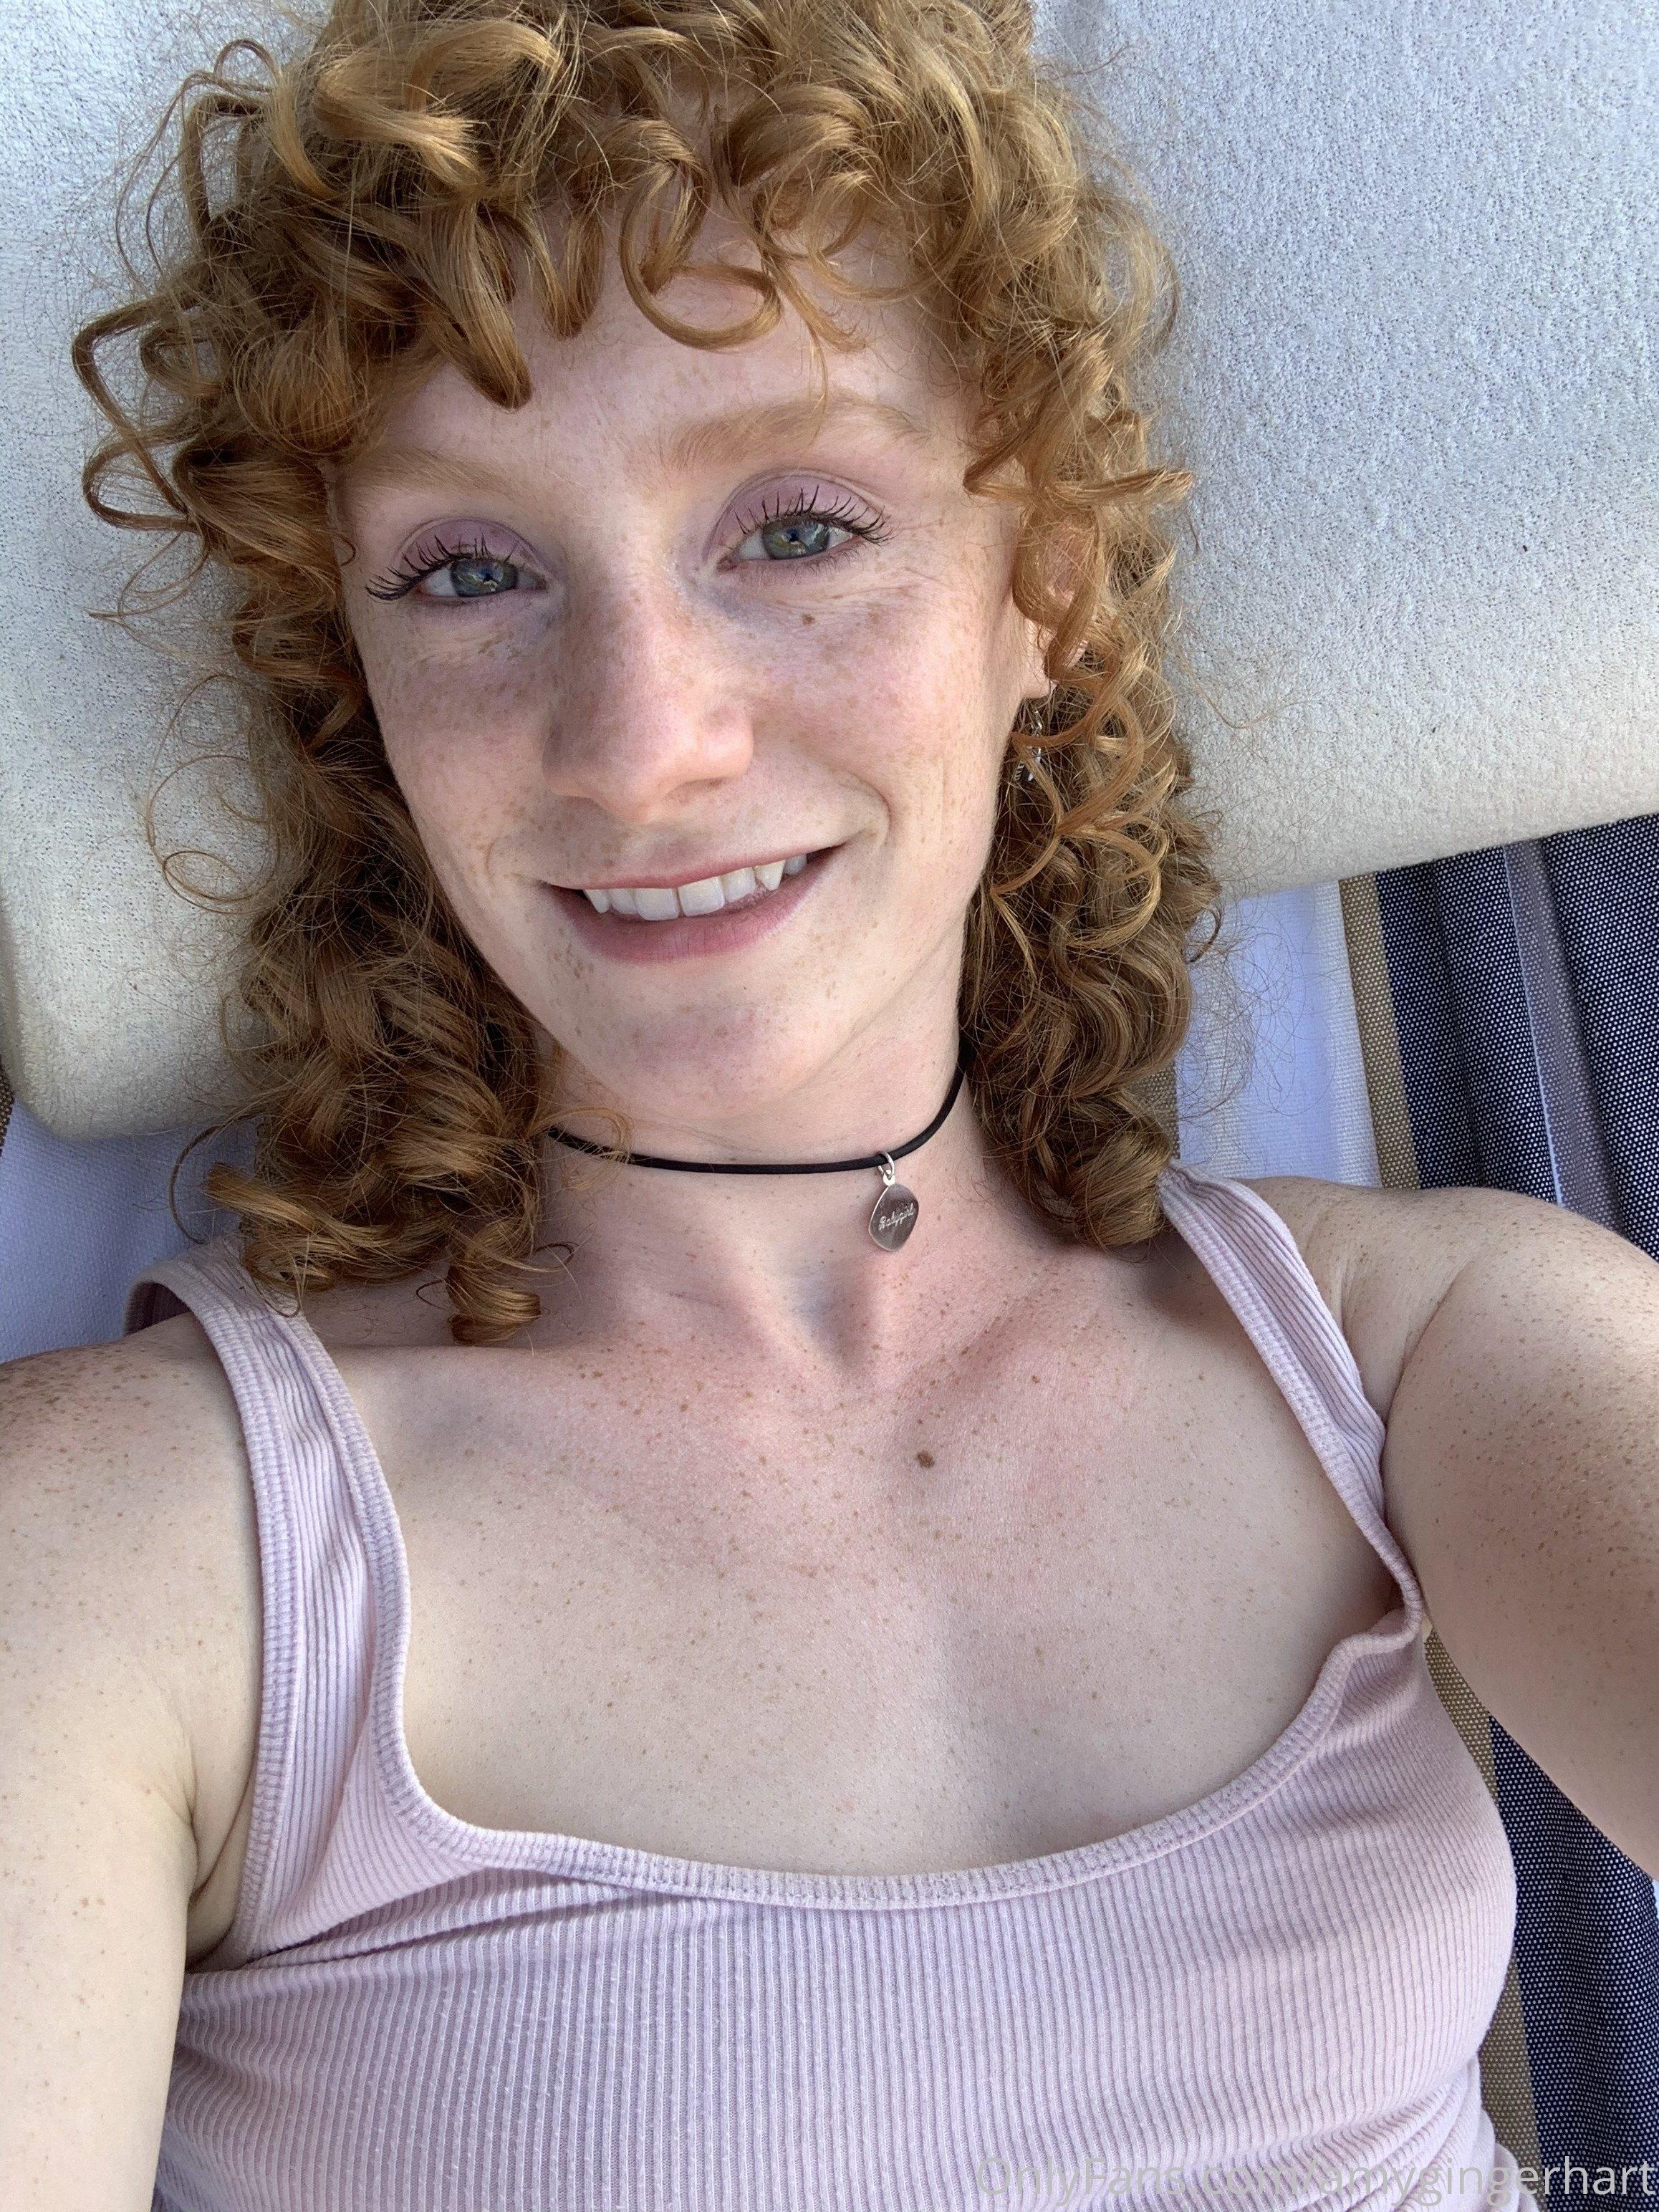 Amy Hart, Amygingerhart, Onlyfans 0281